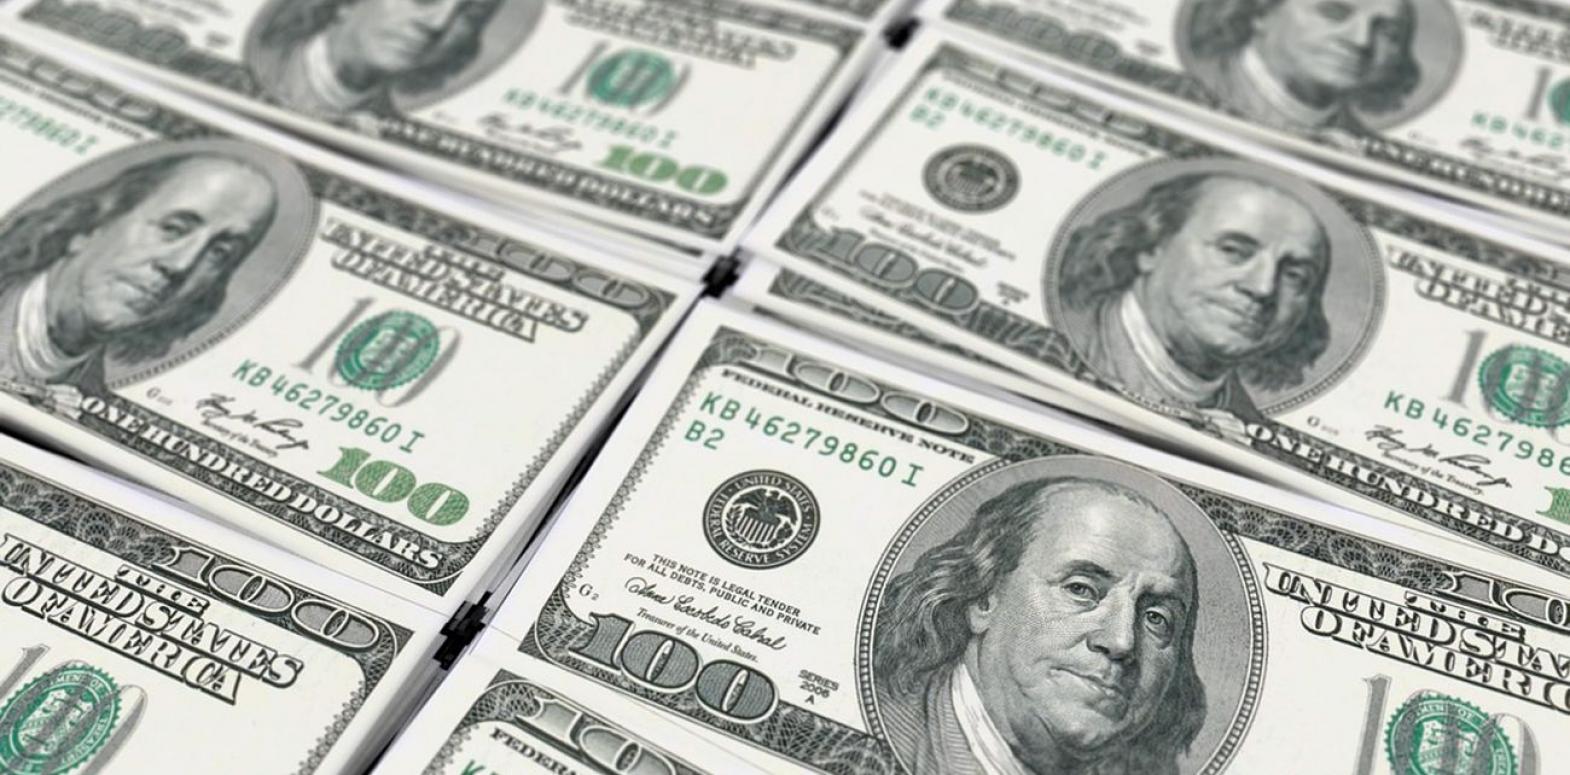 НБУ снизил курс доллара на 24 июня